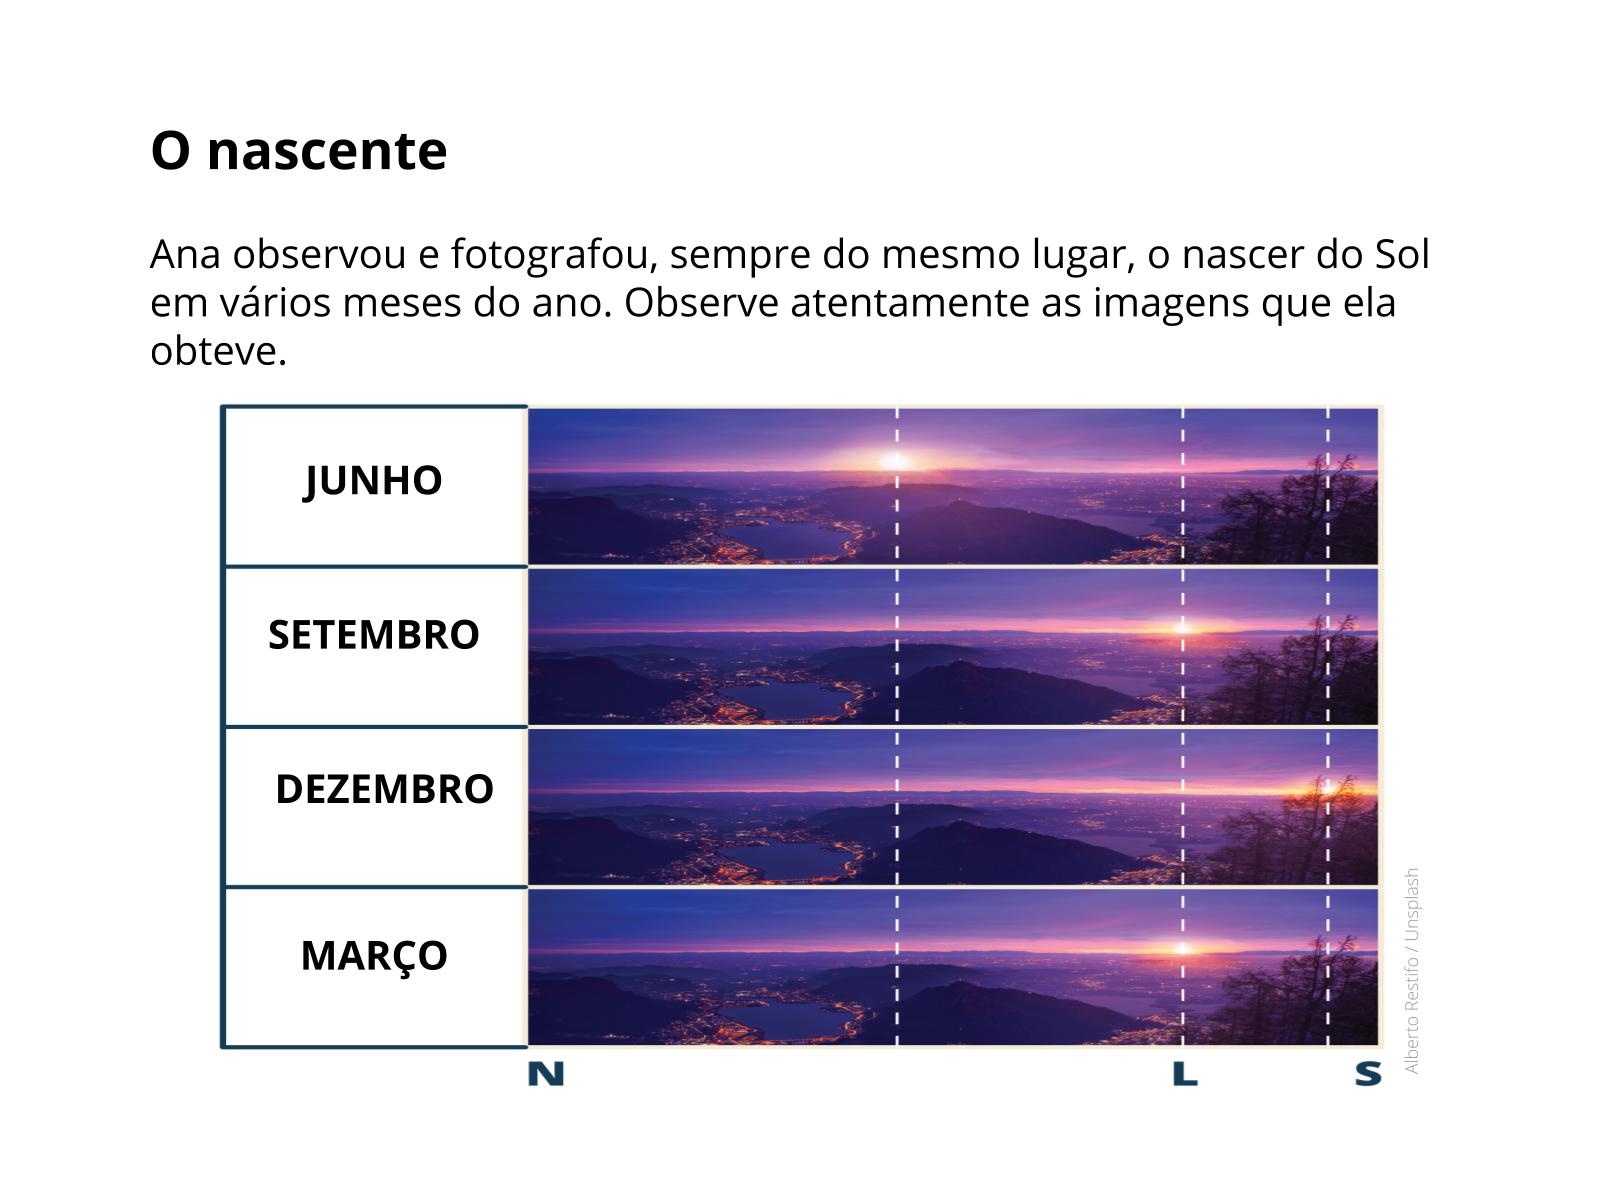 O Sol nasce sempre no mesmo lugar?